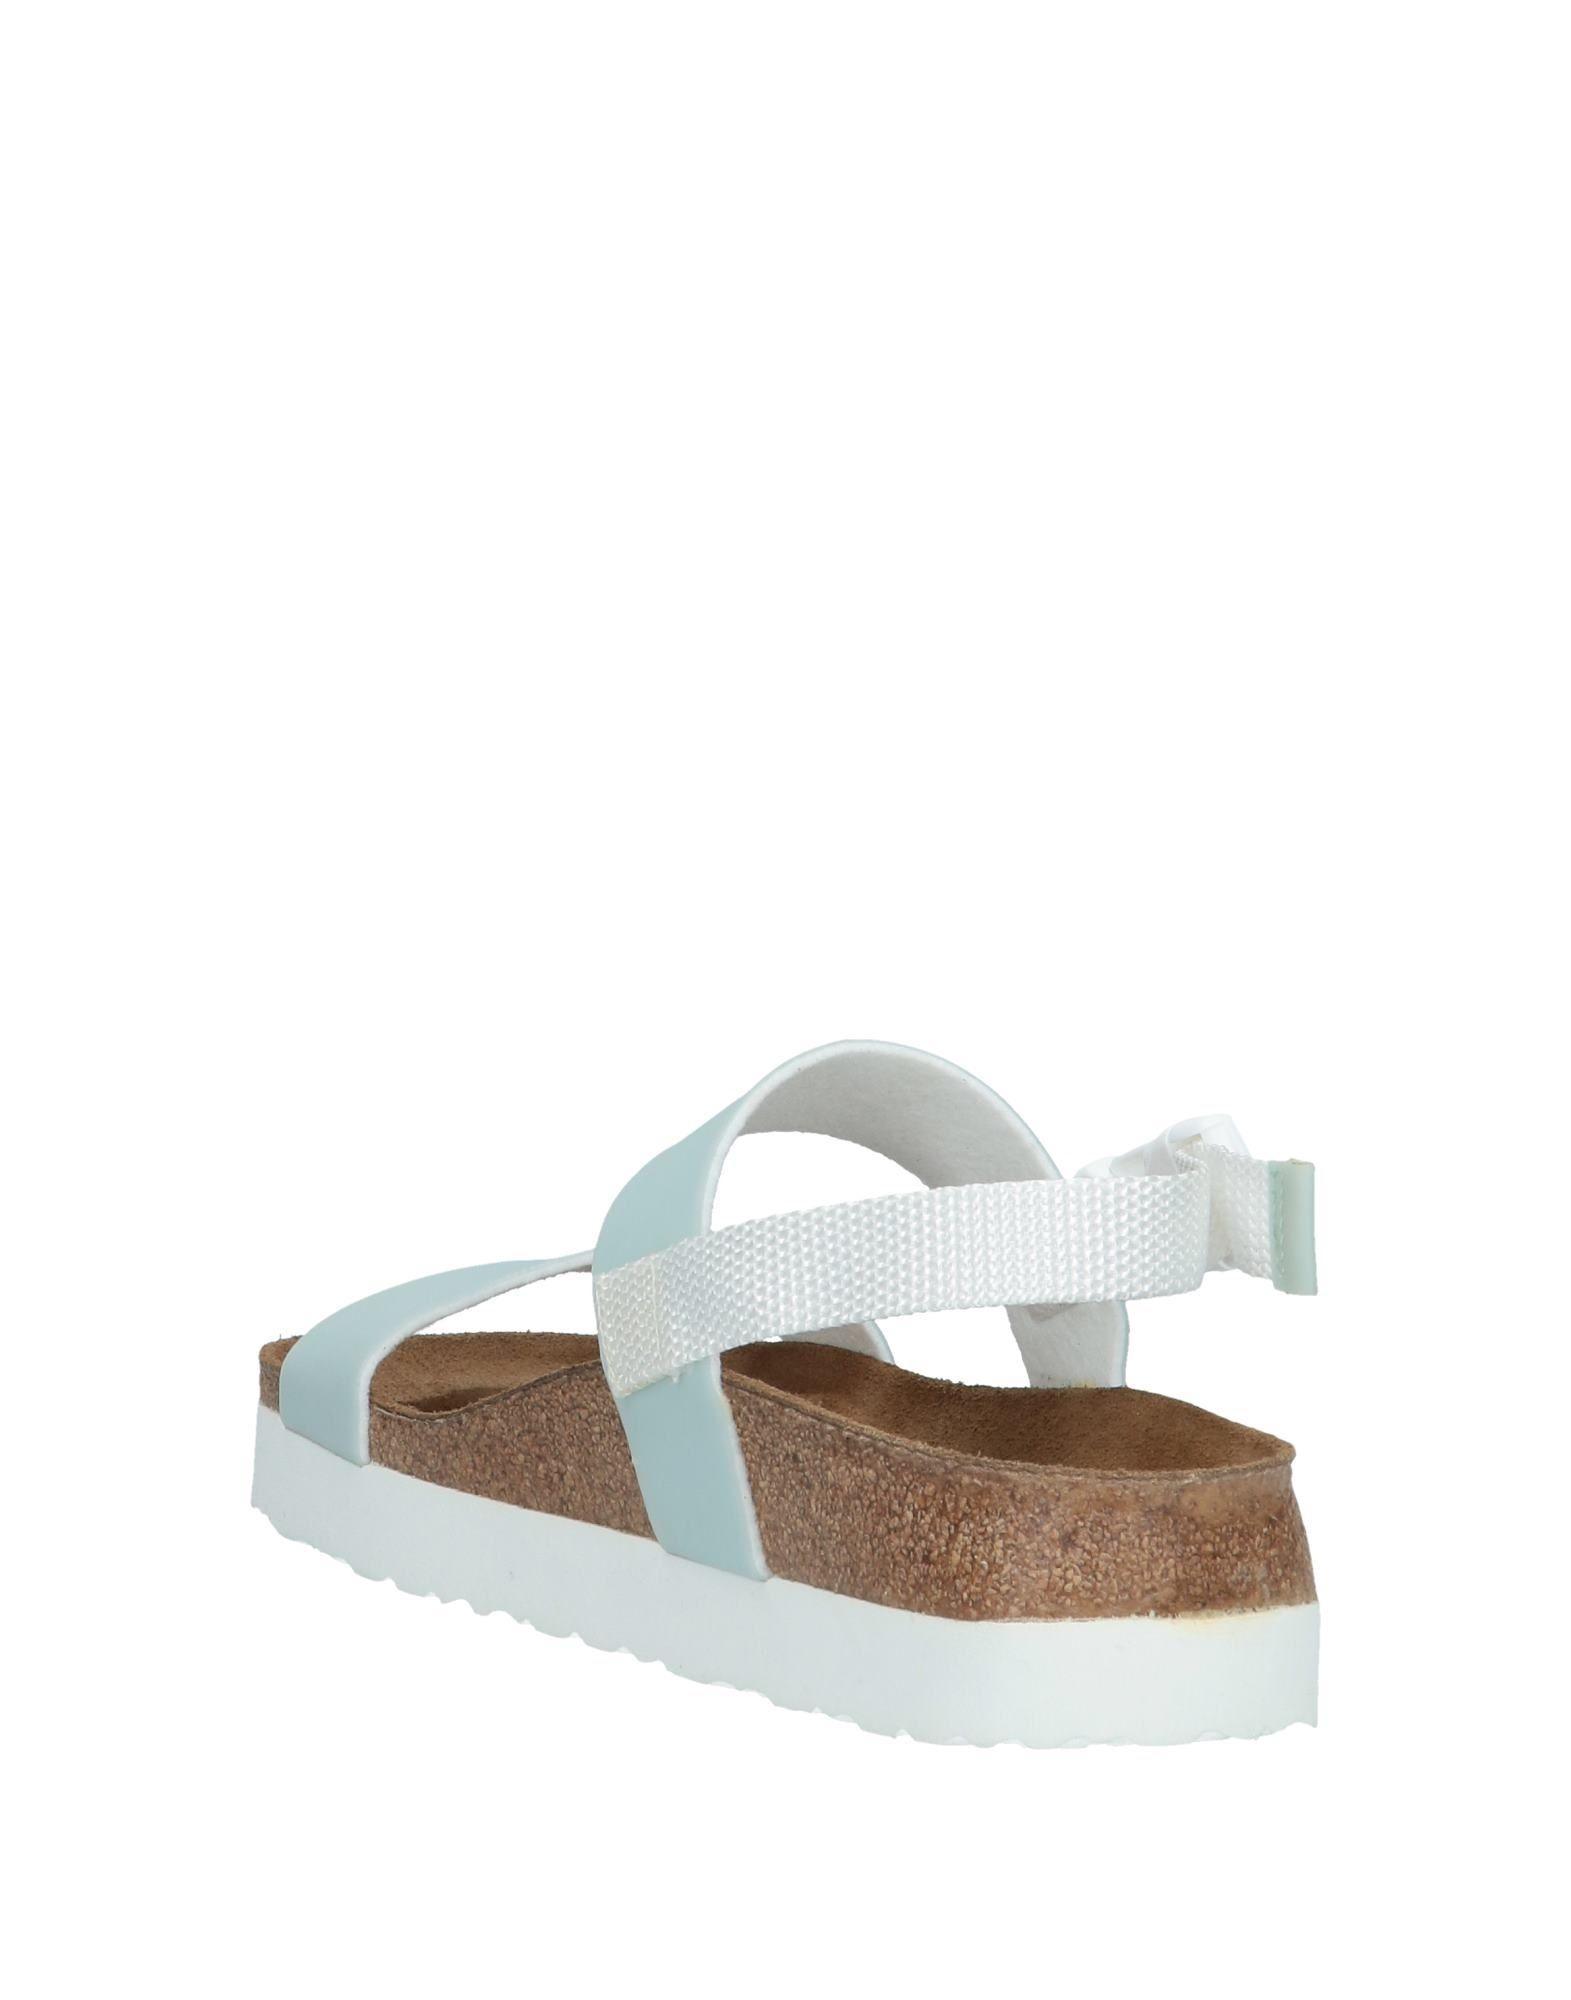 2917f660049437 Birkenstock Sandals in Blue - Lyst